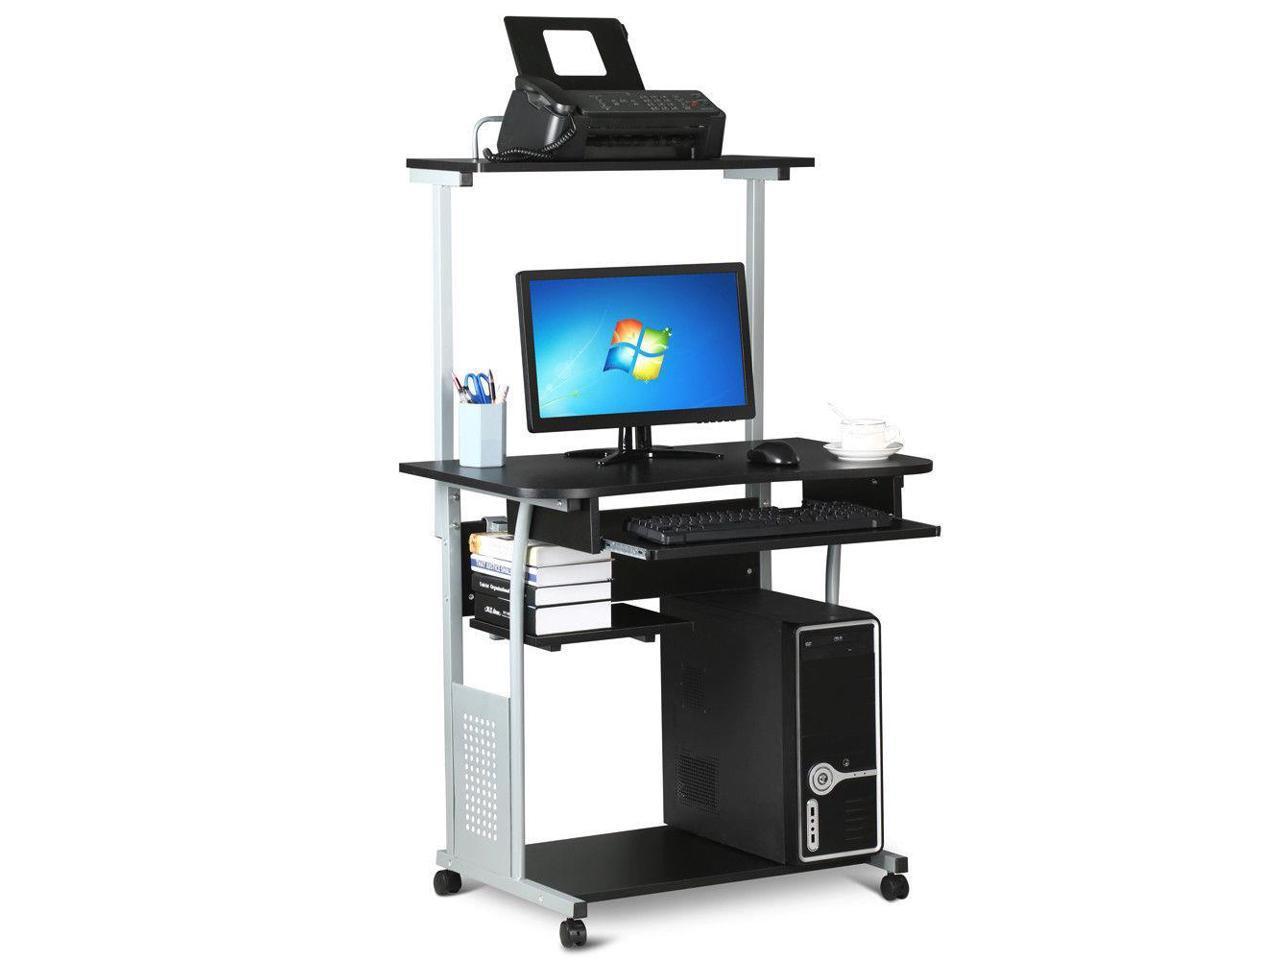 Desk Computer Table W Printer Shelf Home Office Laptop Student Furniture Dorm